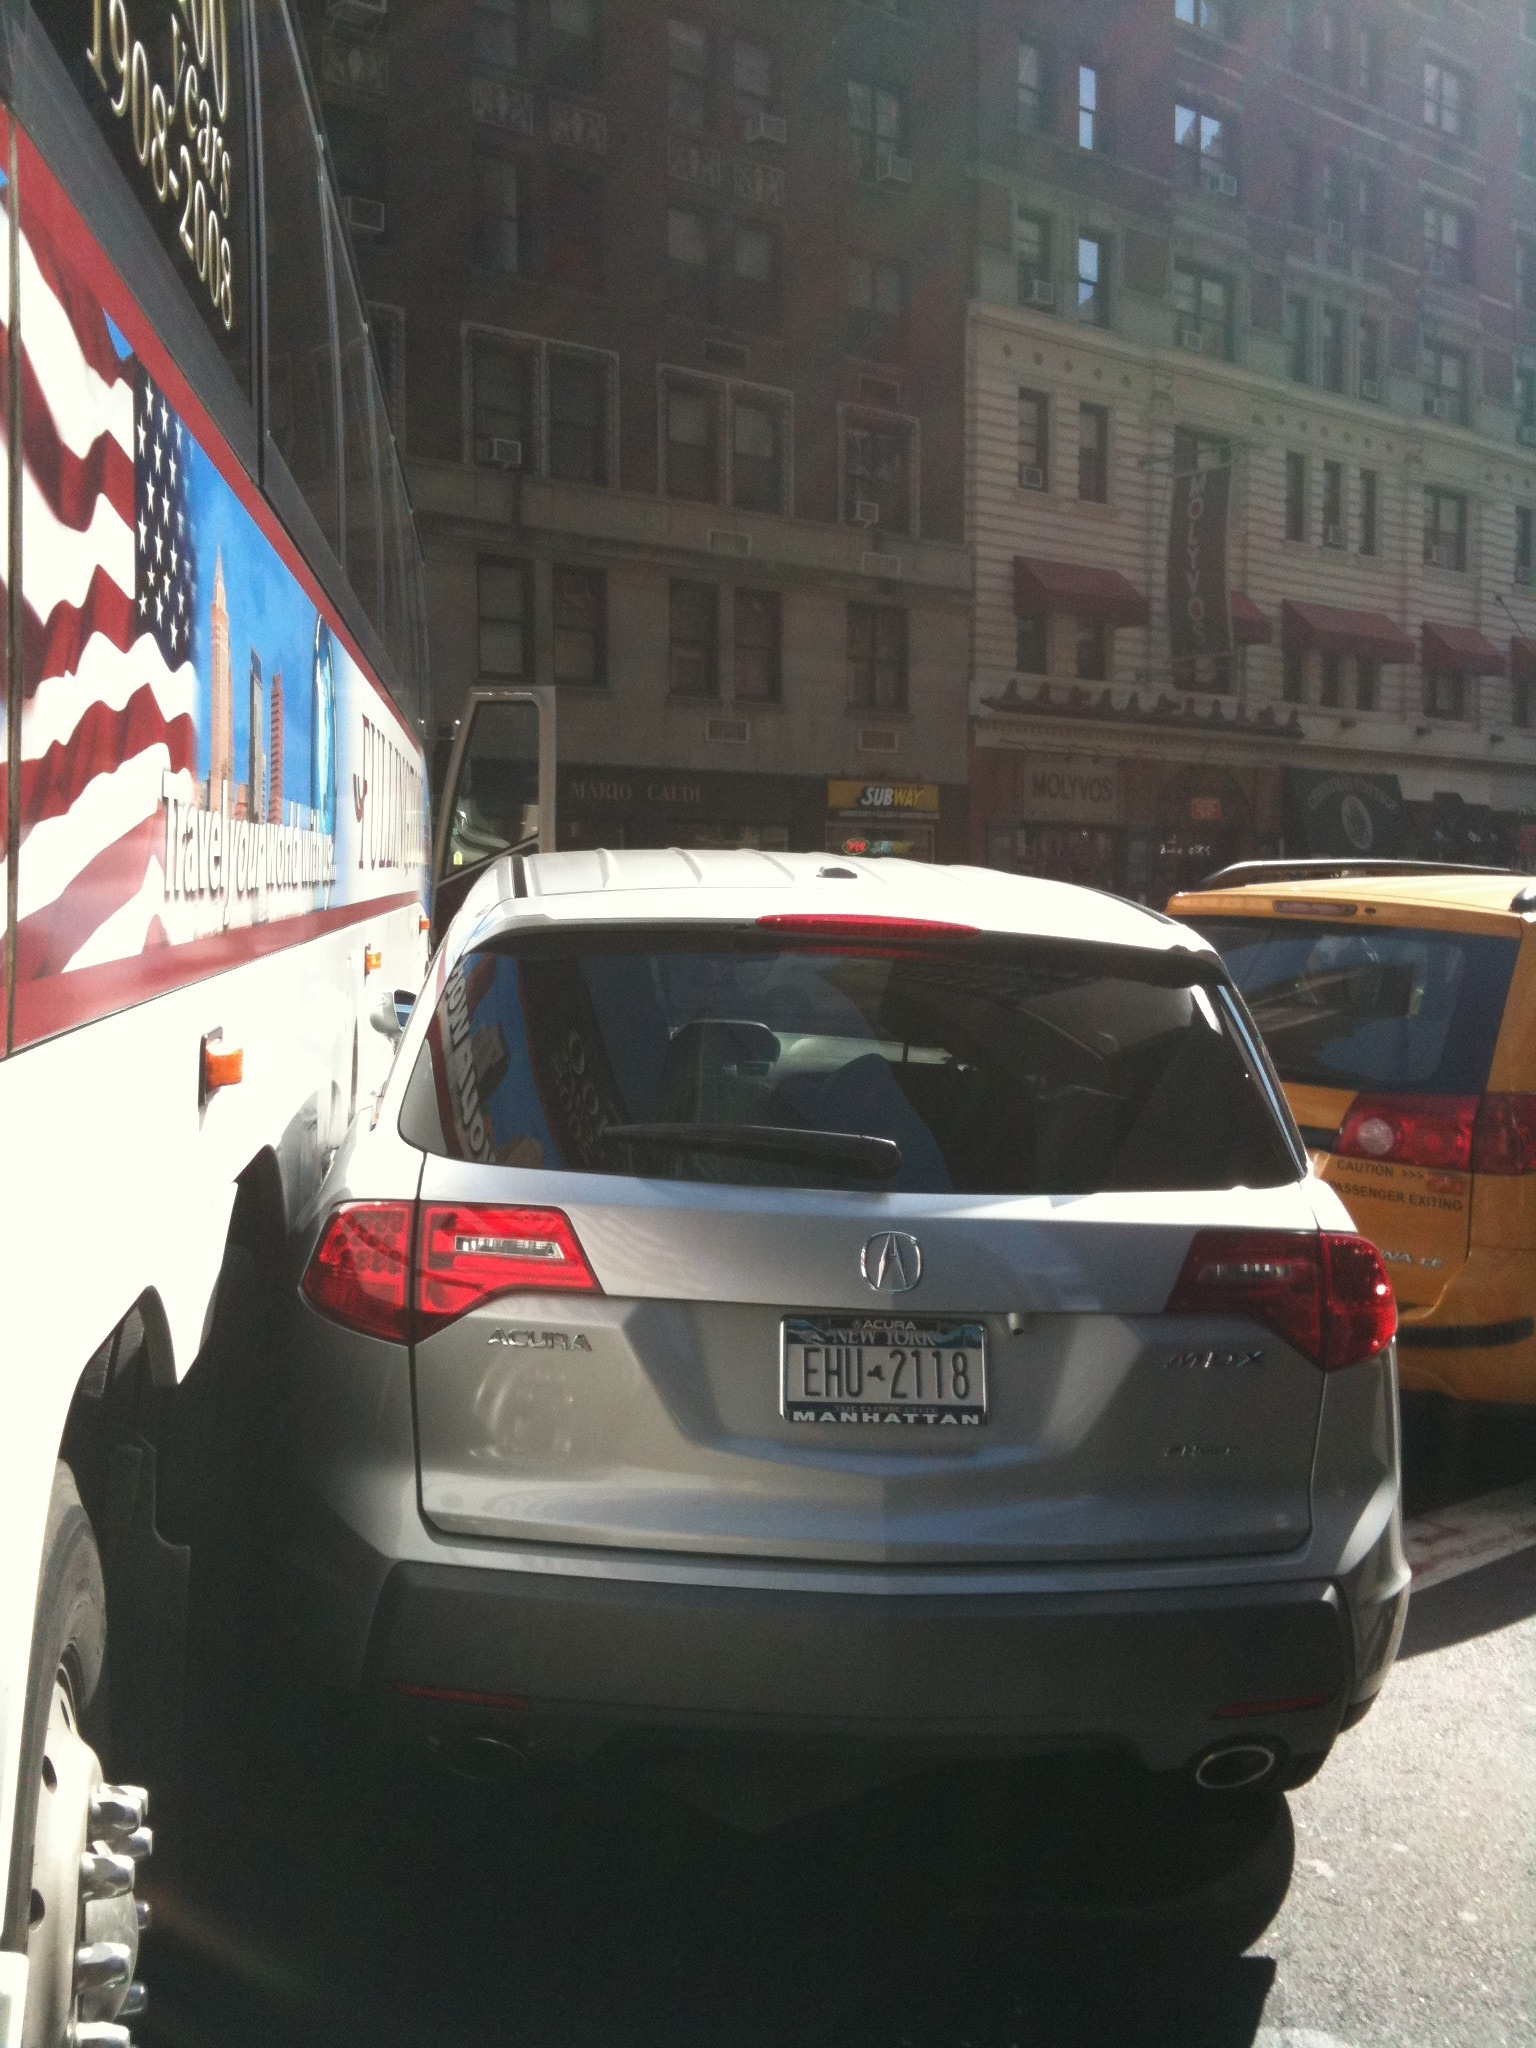 Bus crush 7th Ave